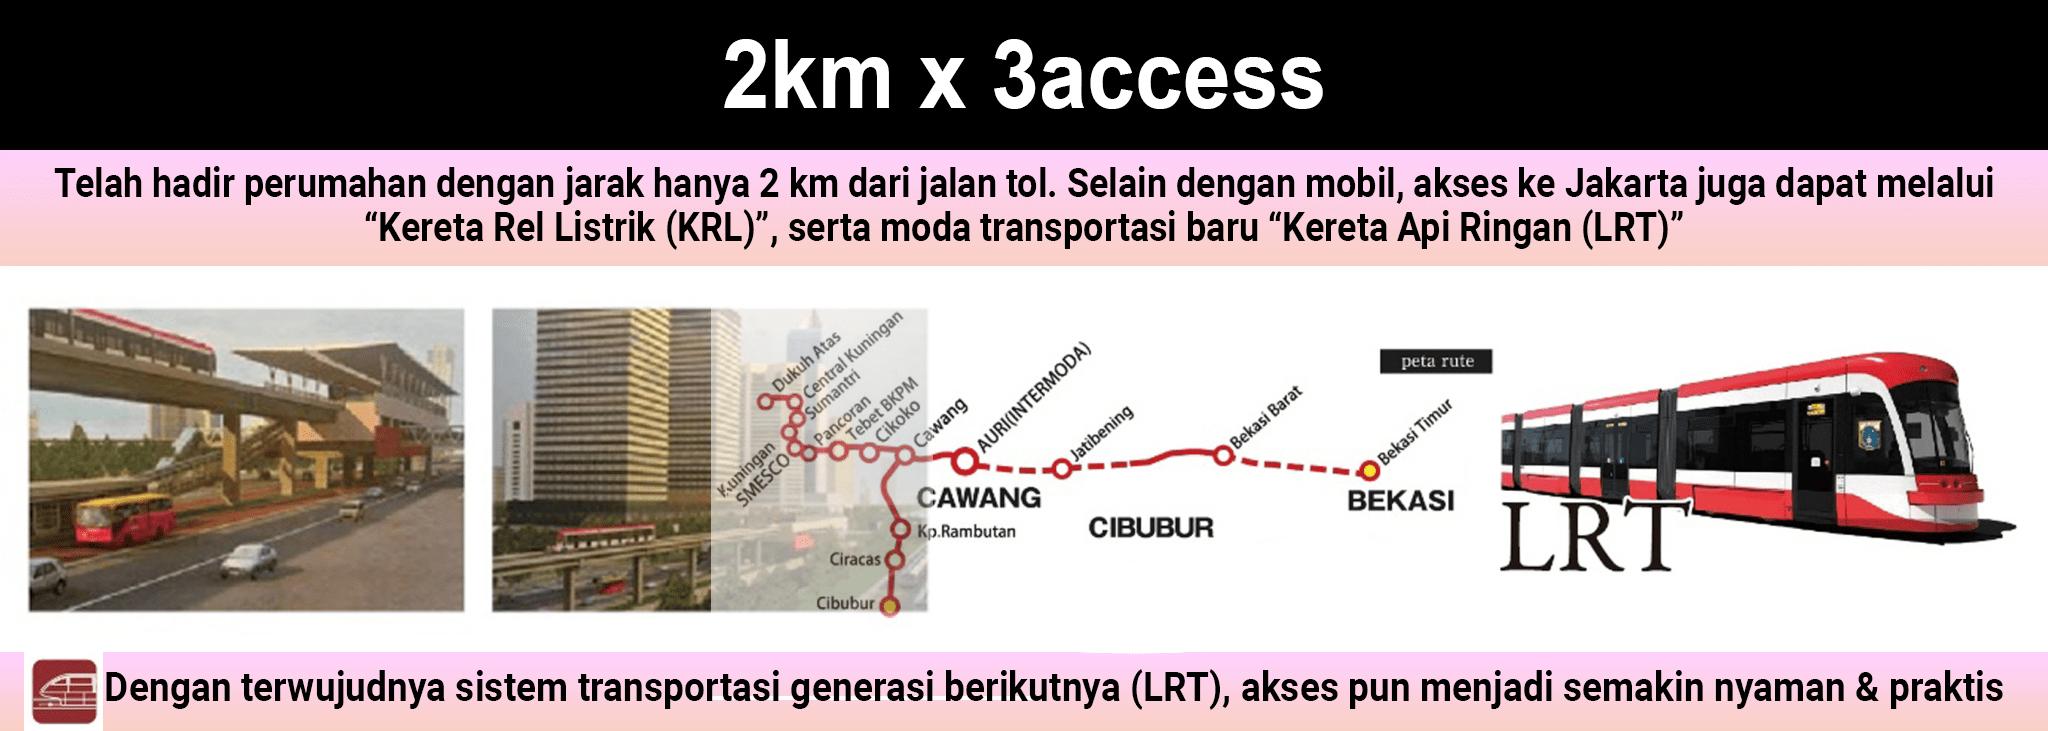 banner-4 2km x 3 access